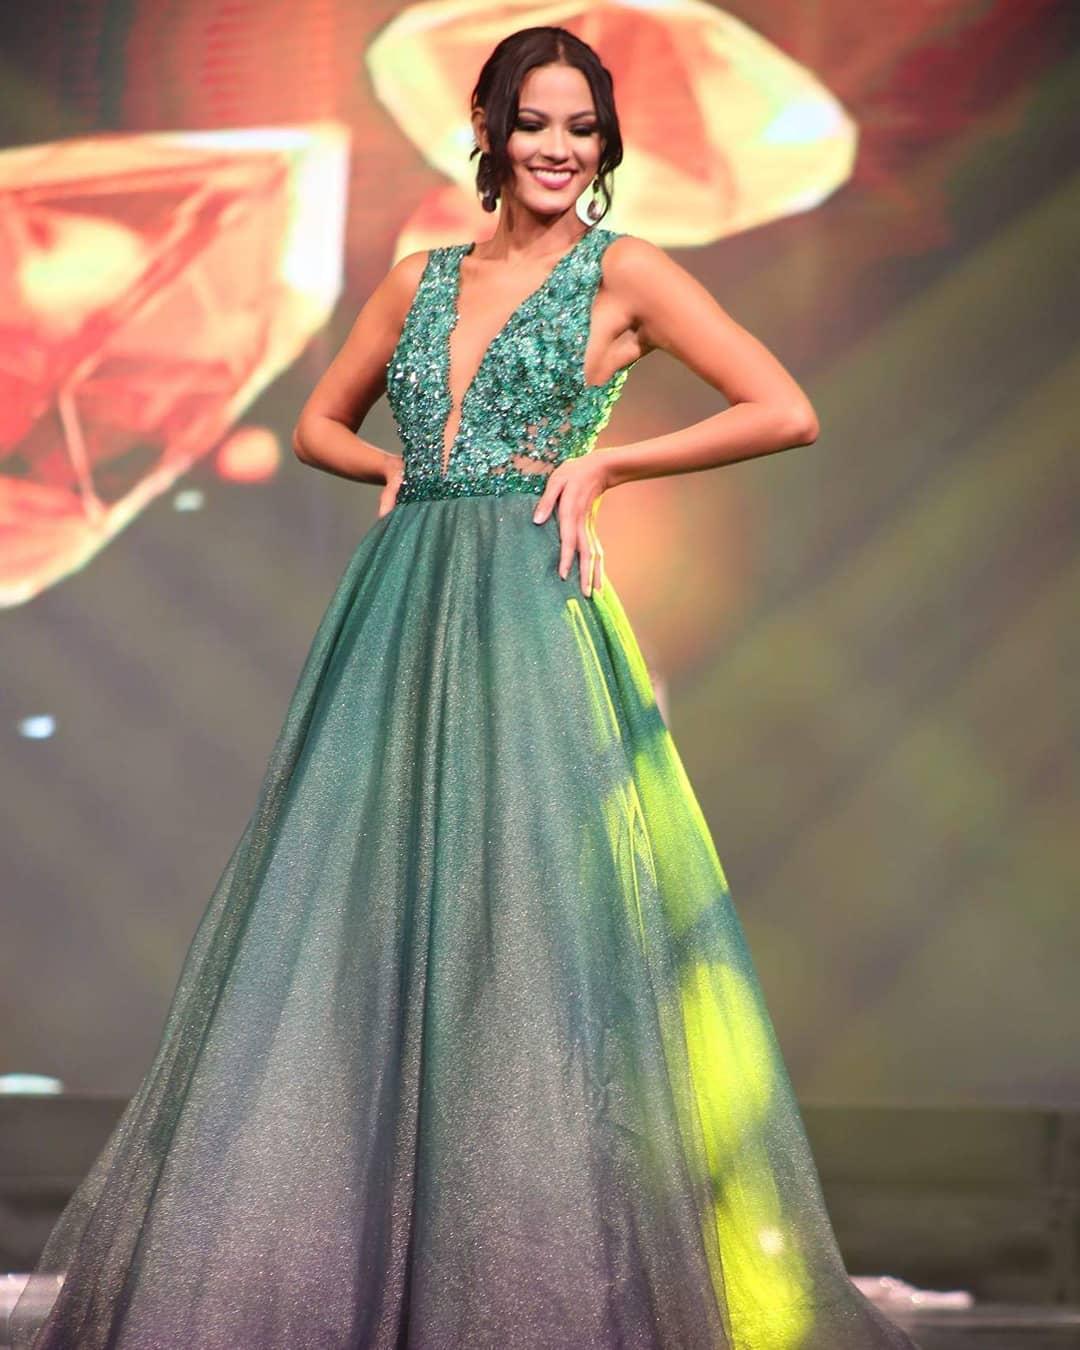 ana catalina mouthon, 2nd runner-up de miss continentes unidos 2018. - Página 4 41080110